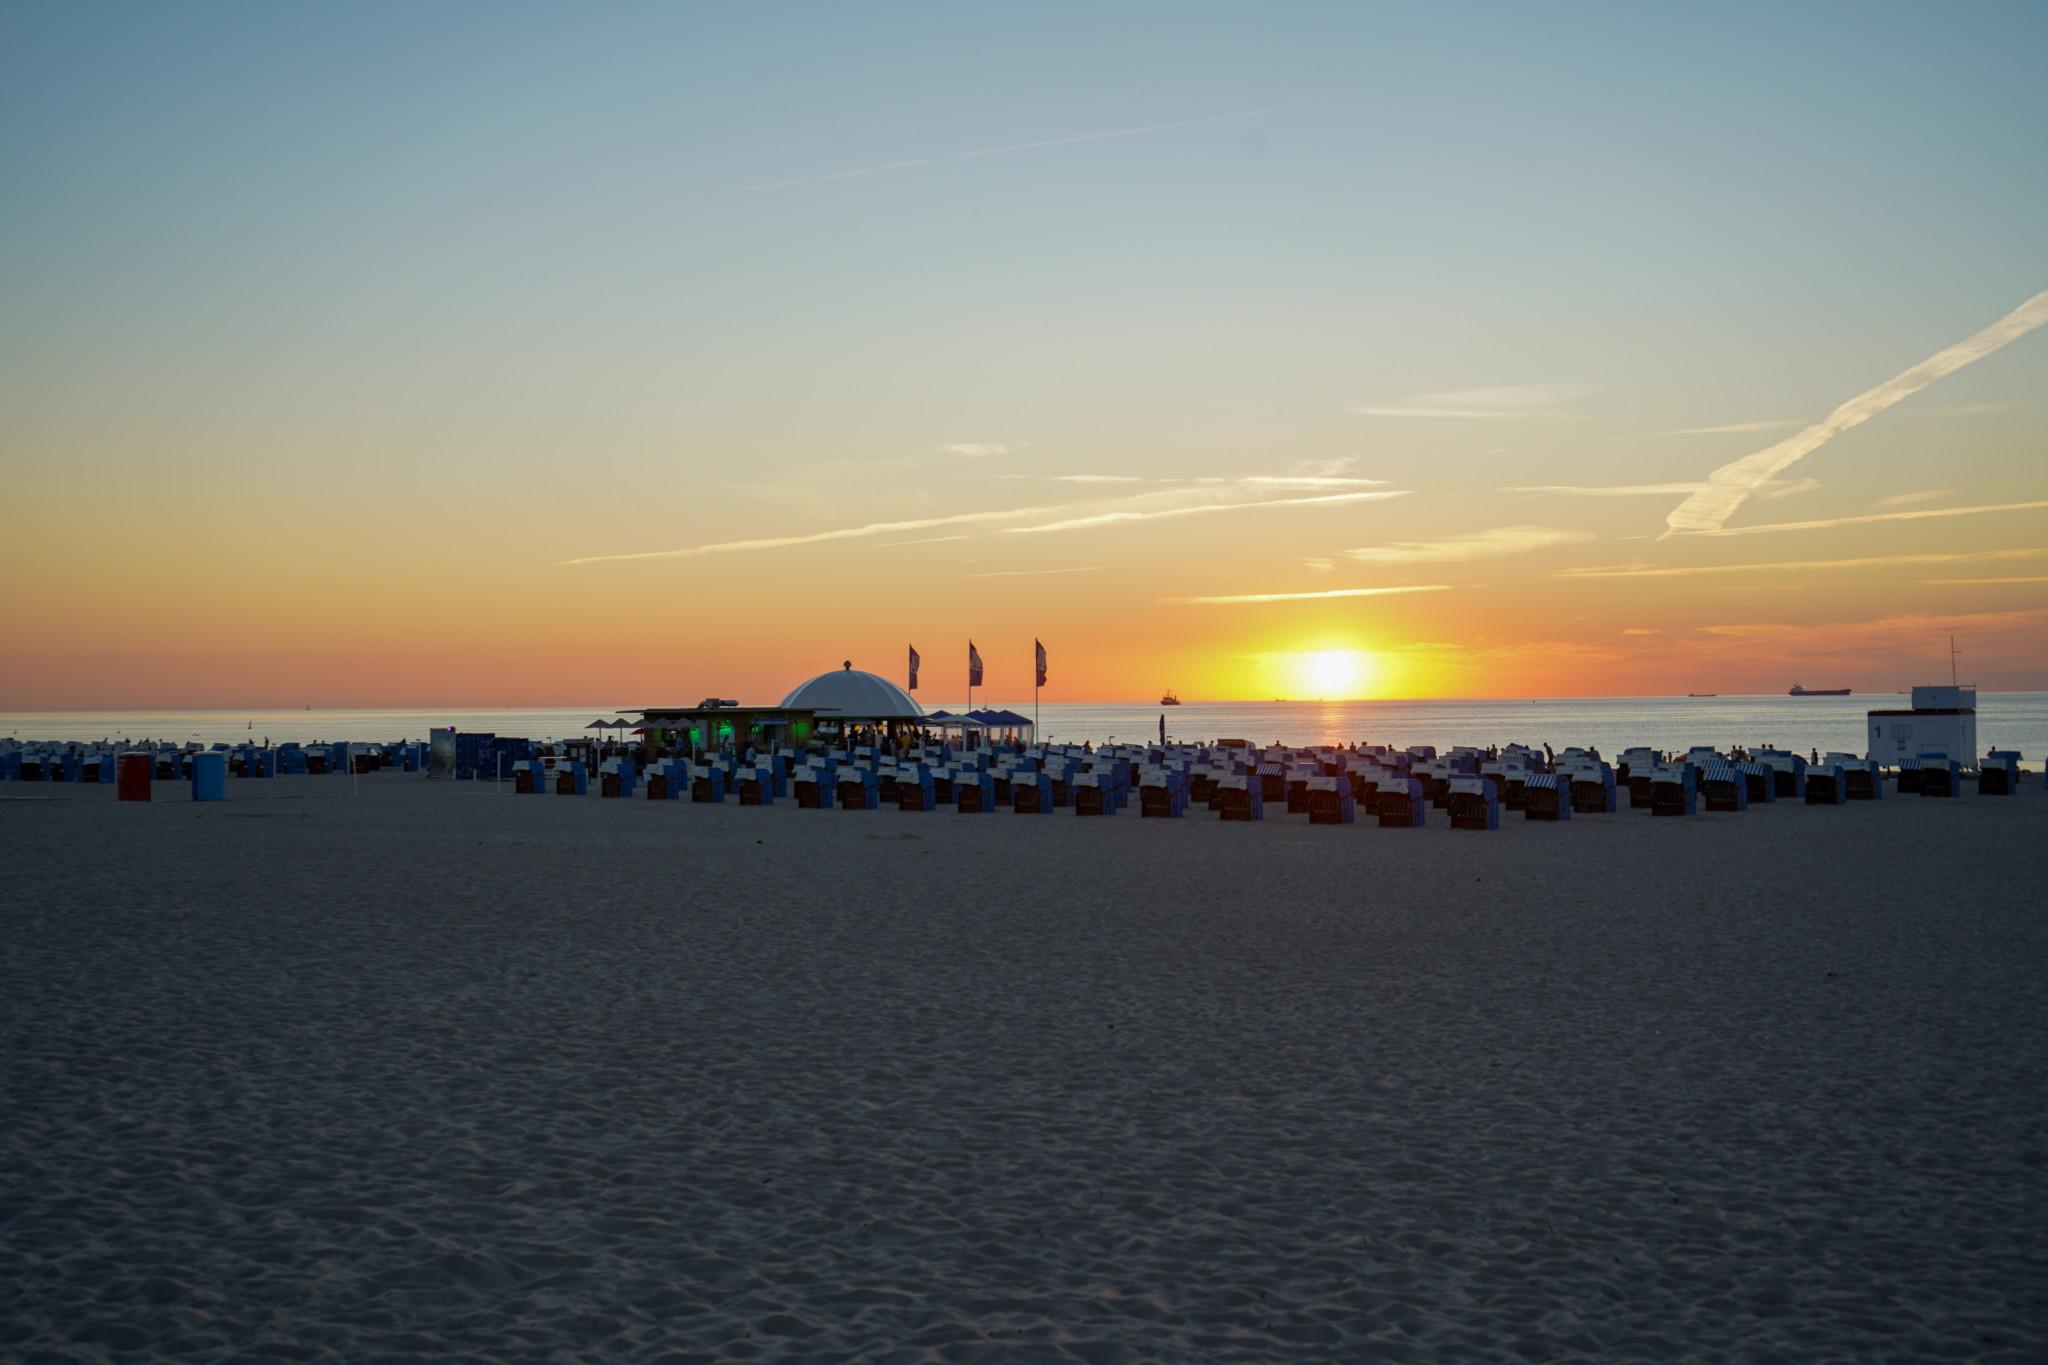 Sonnenuntergang am Ostsee Strand Warnemünde